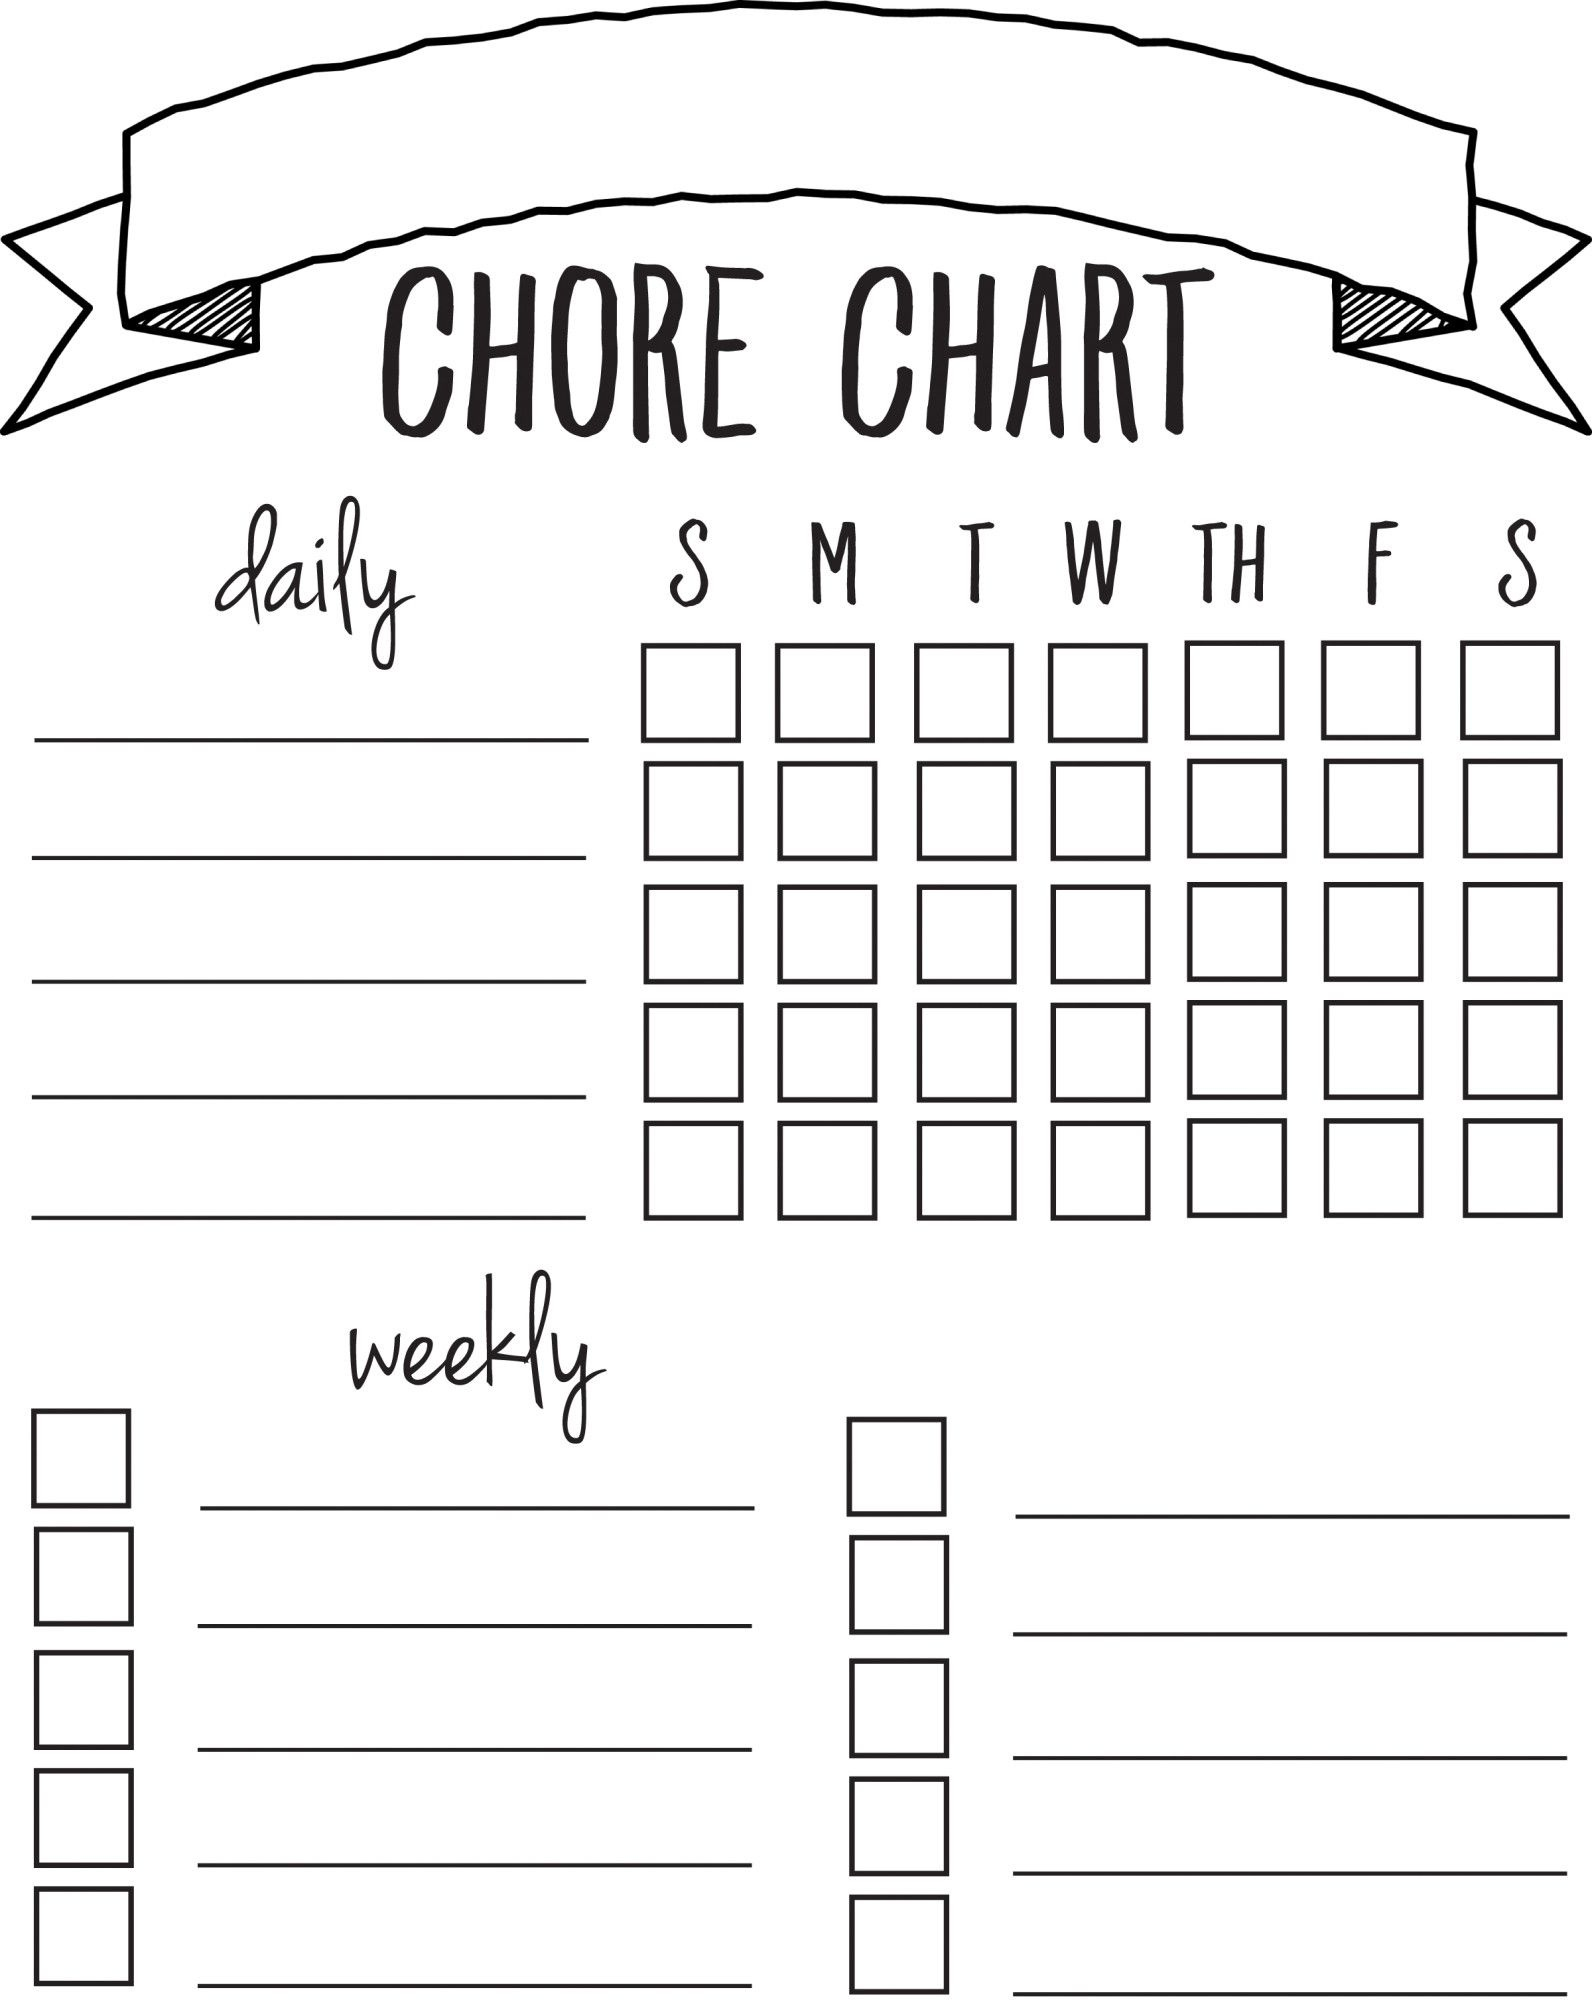 Diy Printable Chore Chart   Free Printables Nov/feb   Chore Chart - Free Printable Pictures For Chore Charts